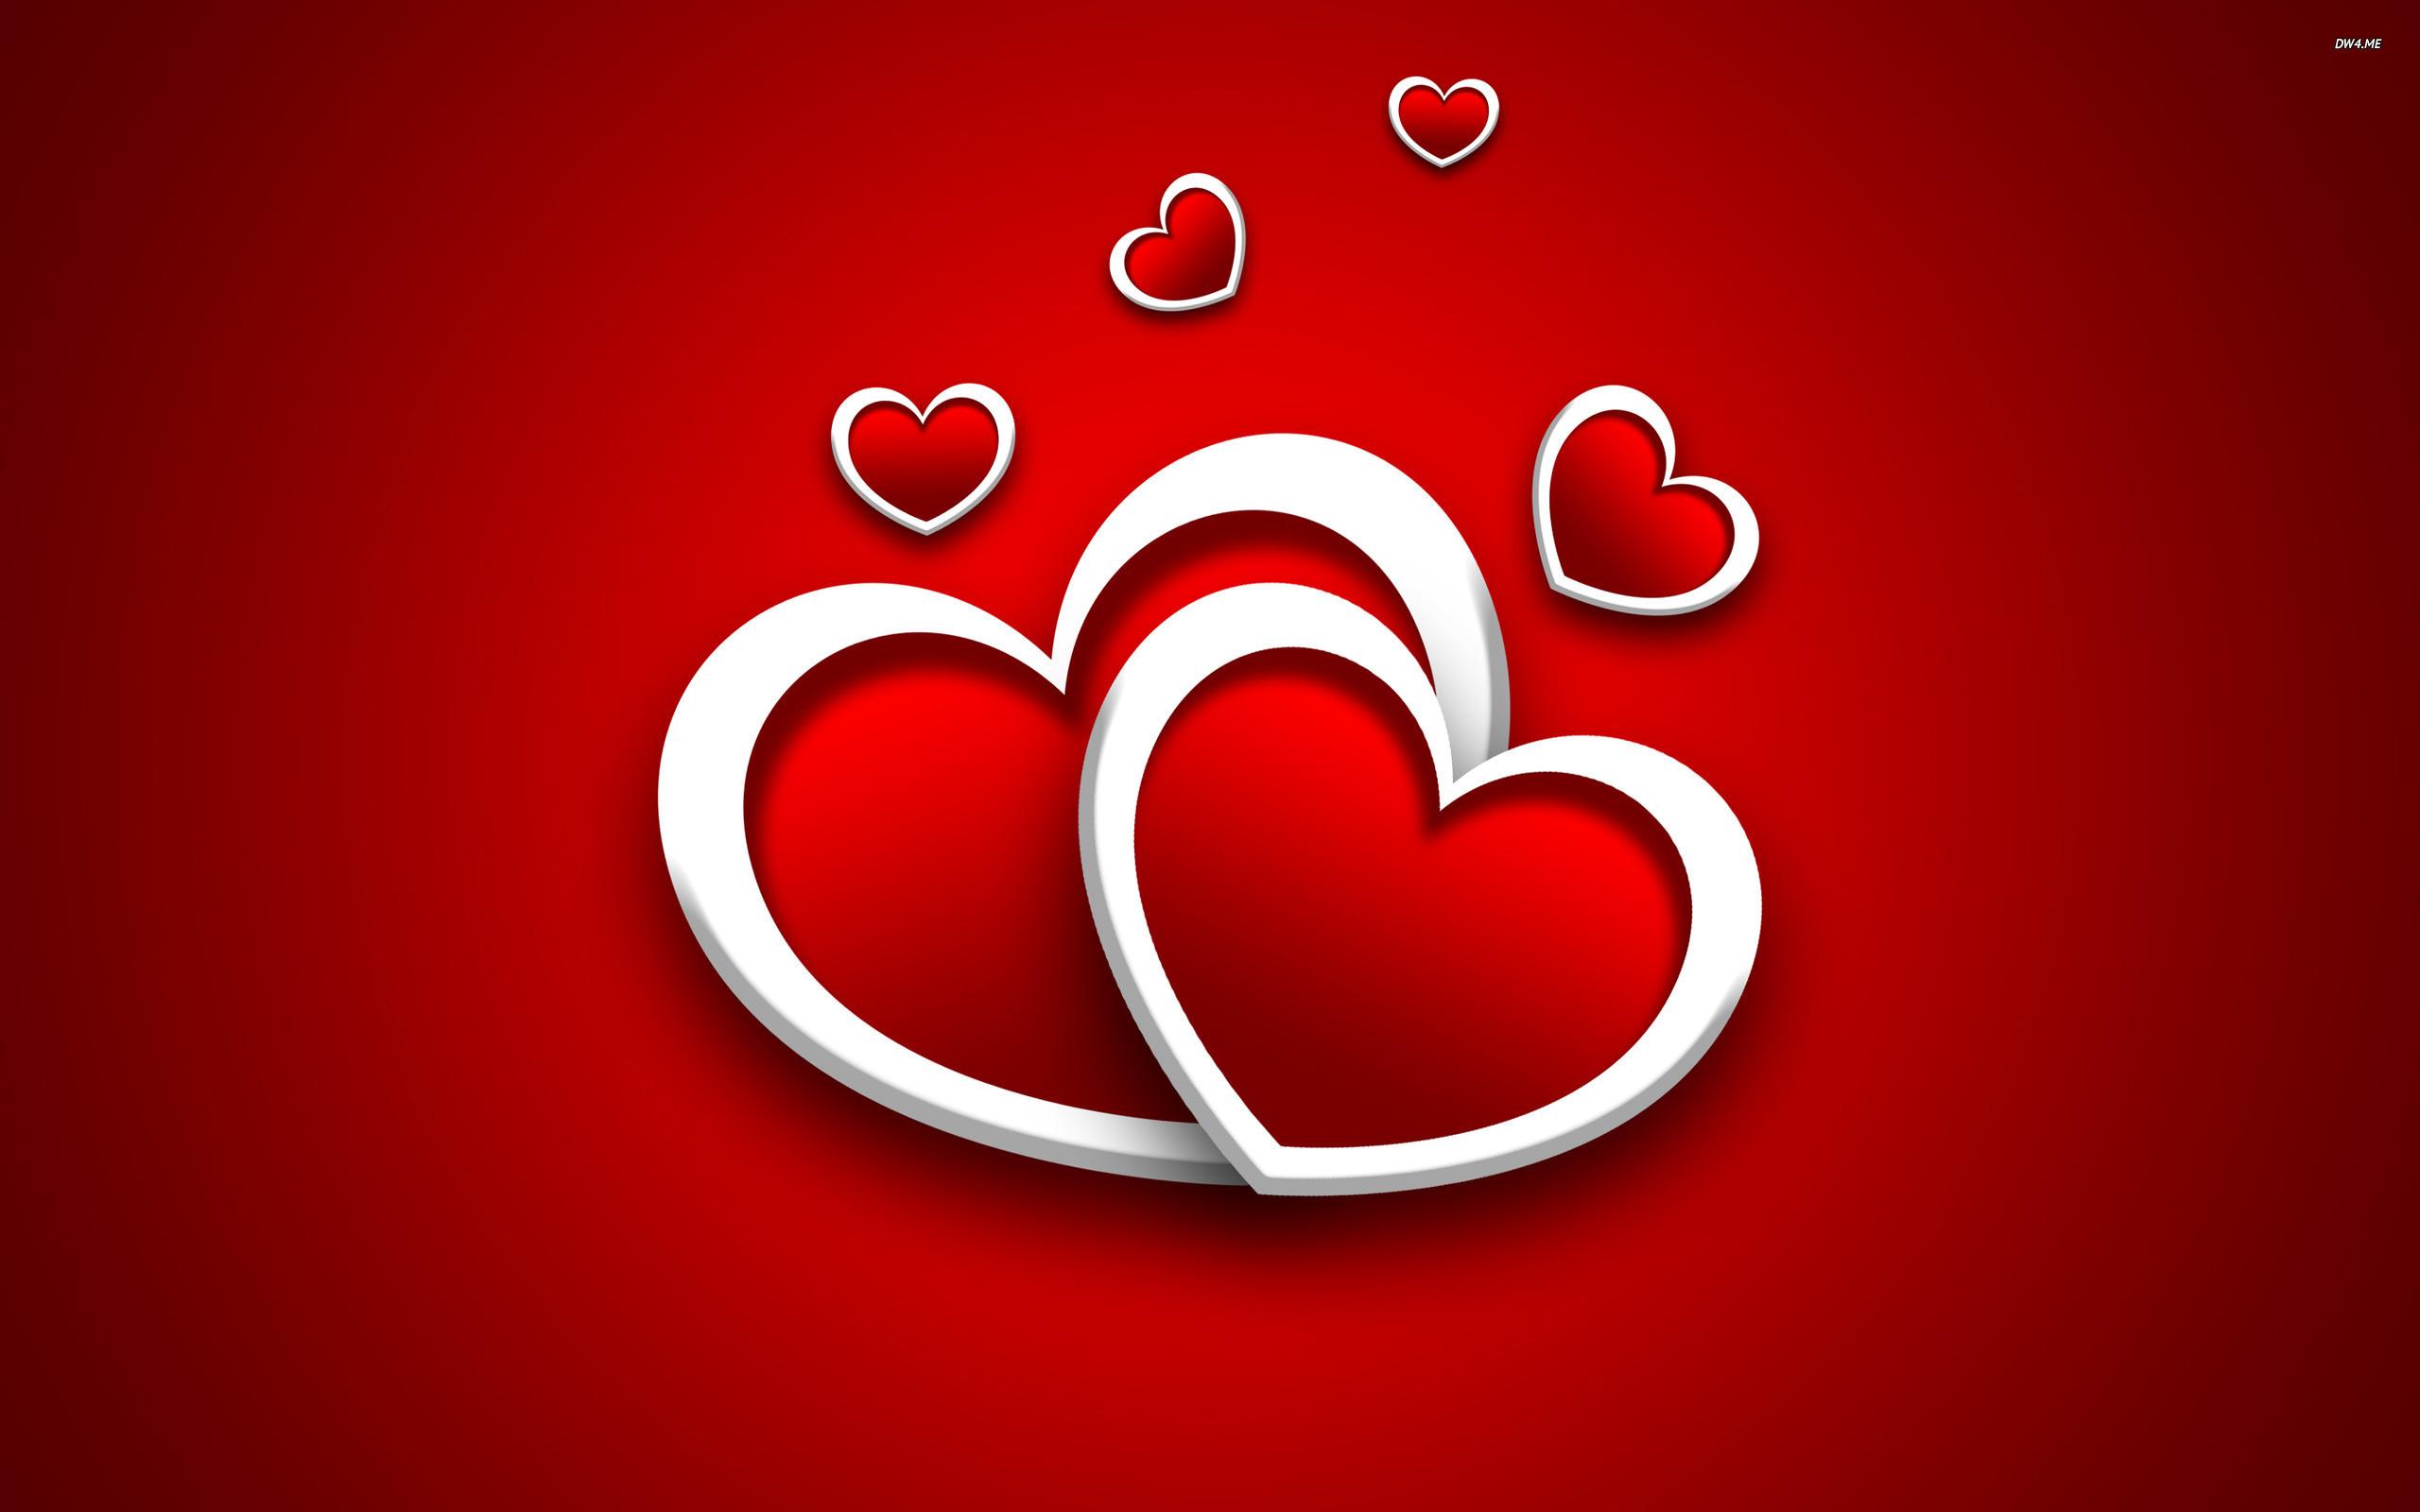 1920x1080 Love Heart Wallpapers